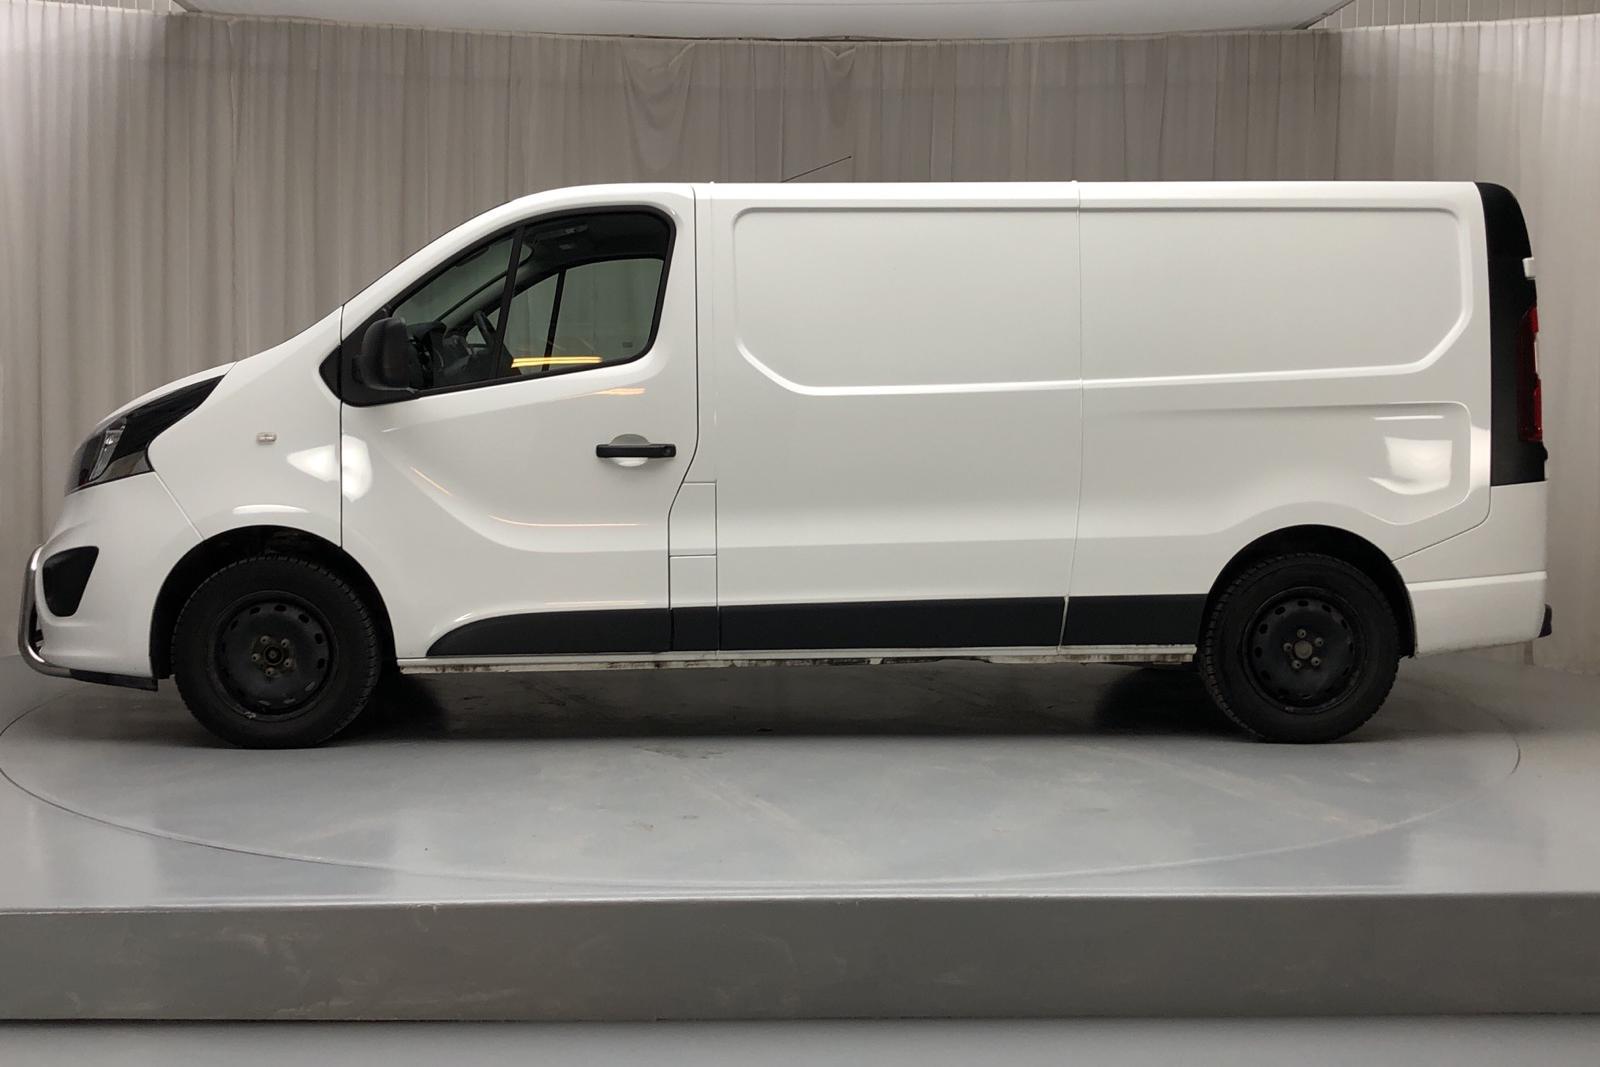 Opel Vivaro 1.6 BITURBO (125hk) - 5 146 mil - Manuell - vit - 2018